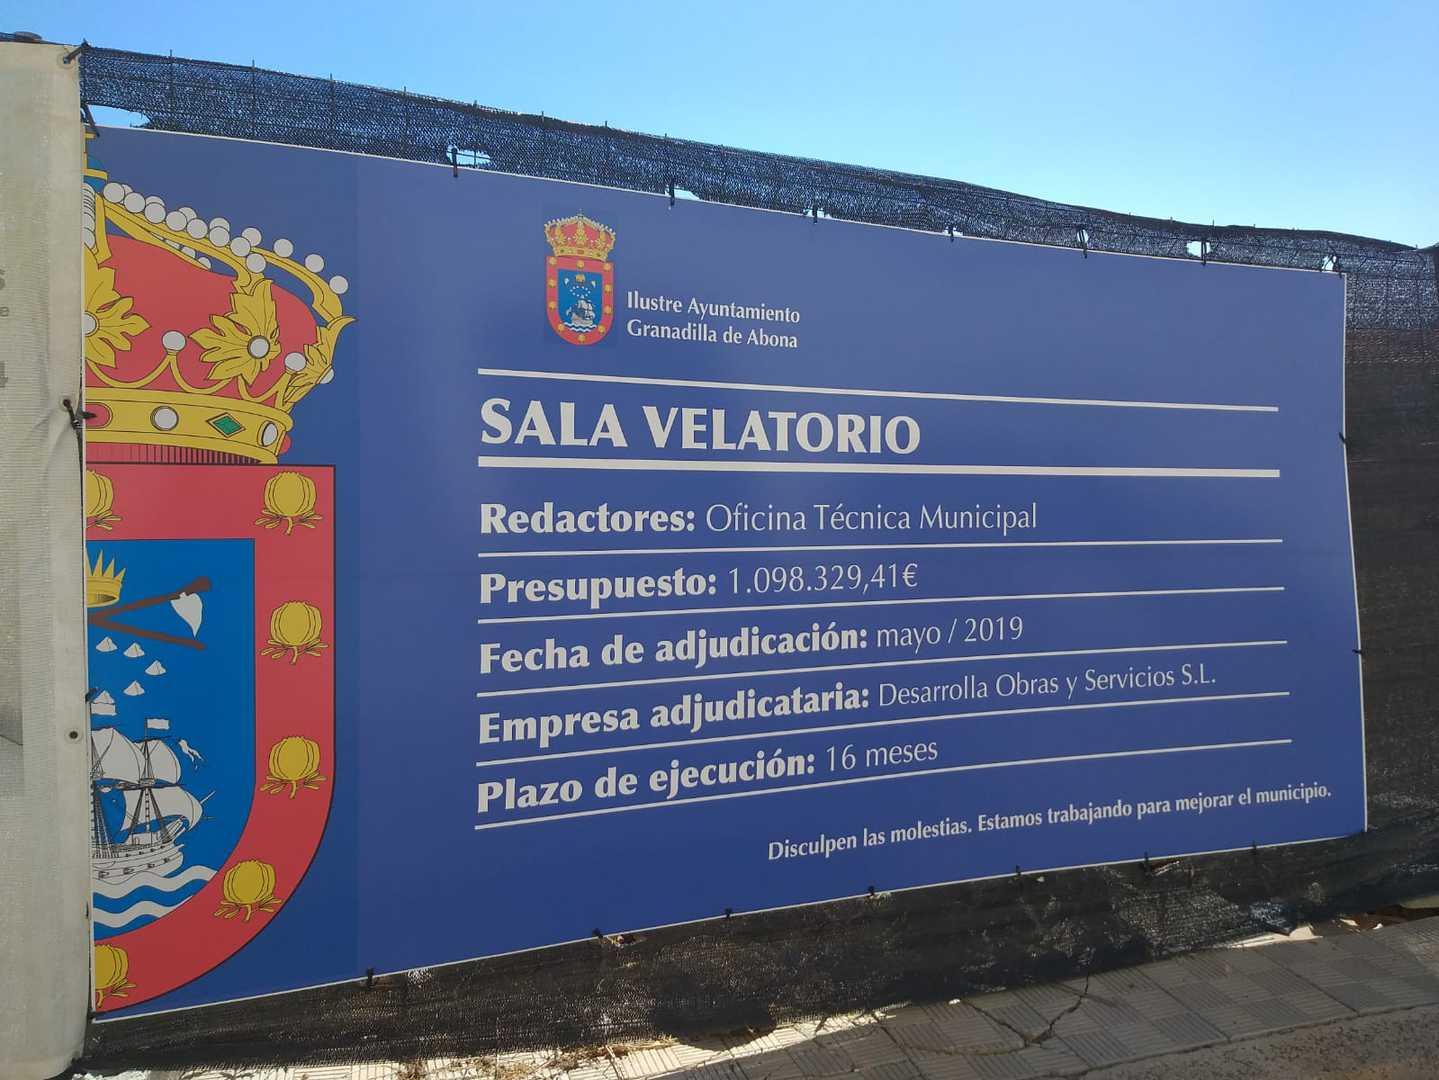 La polémica 'sala velatorio' del Casco (I)